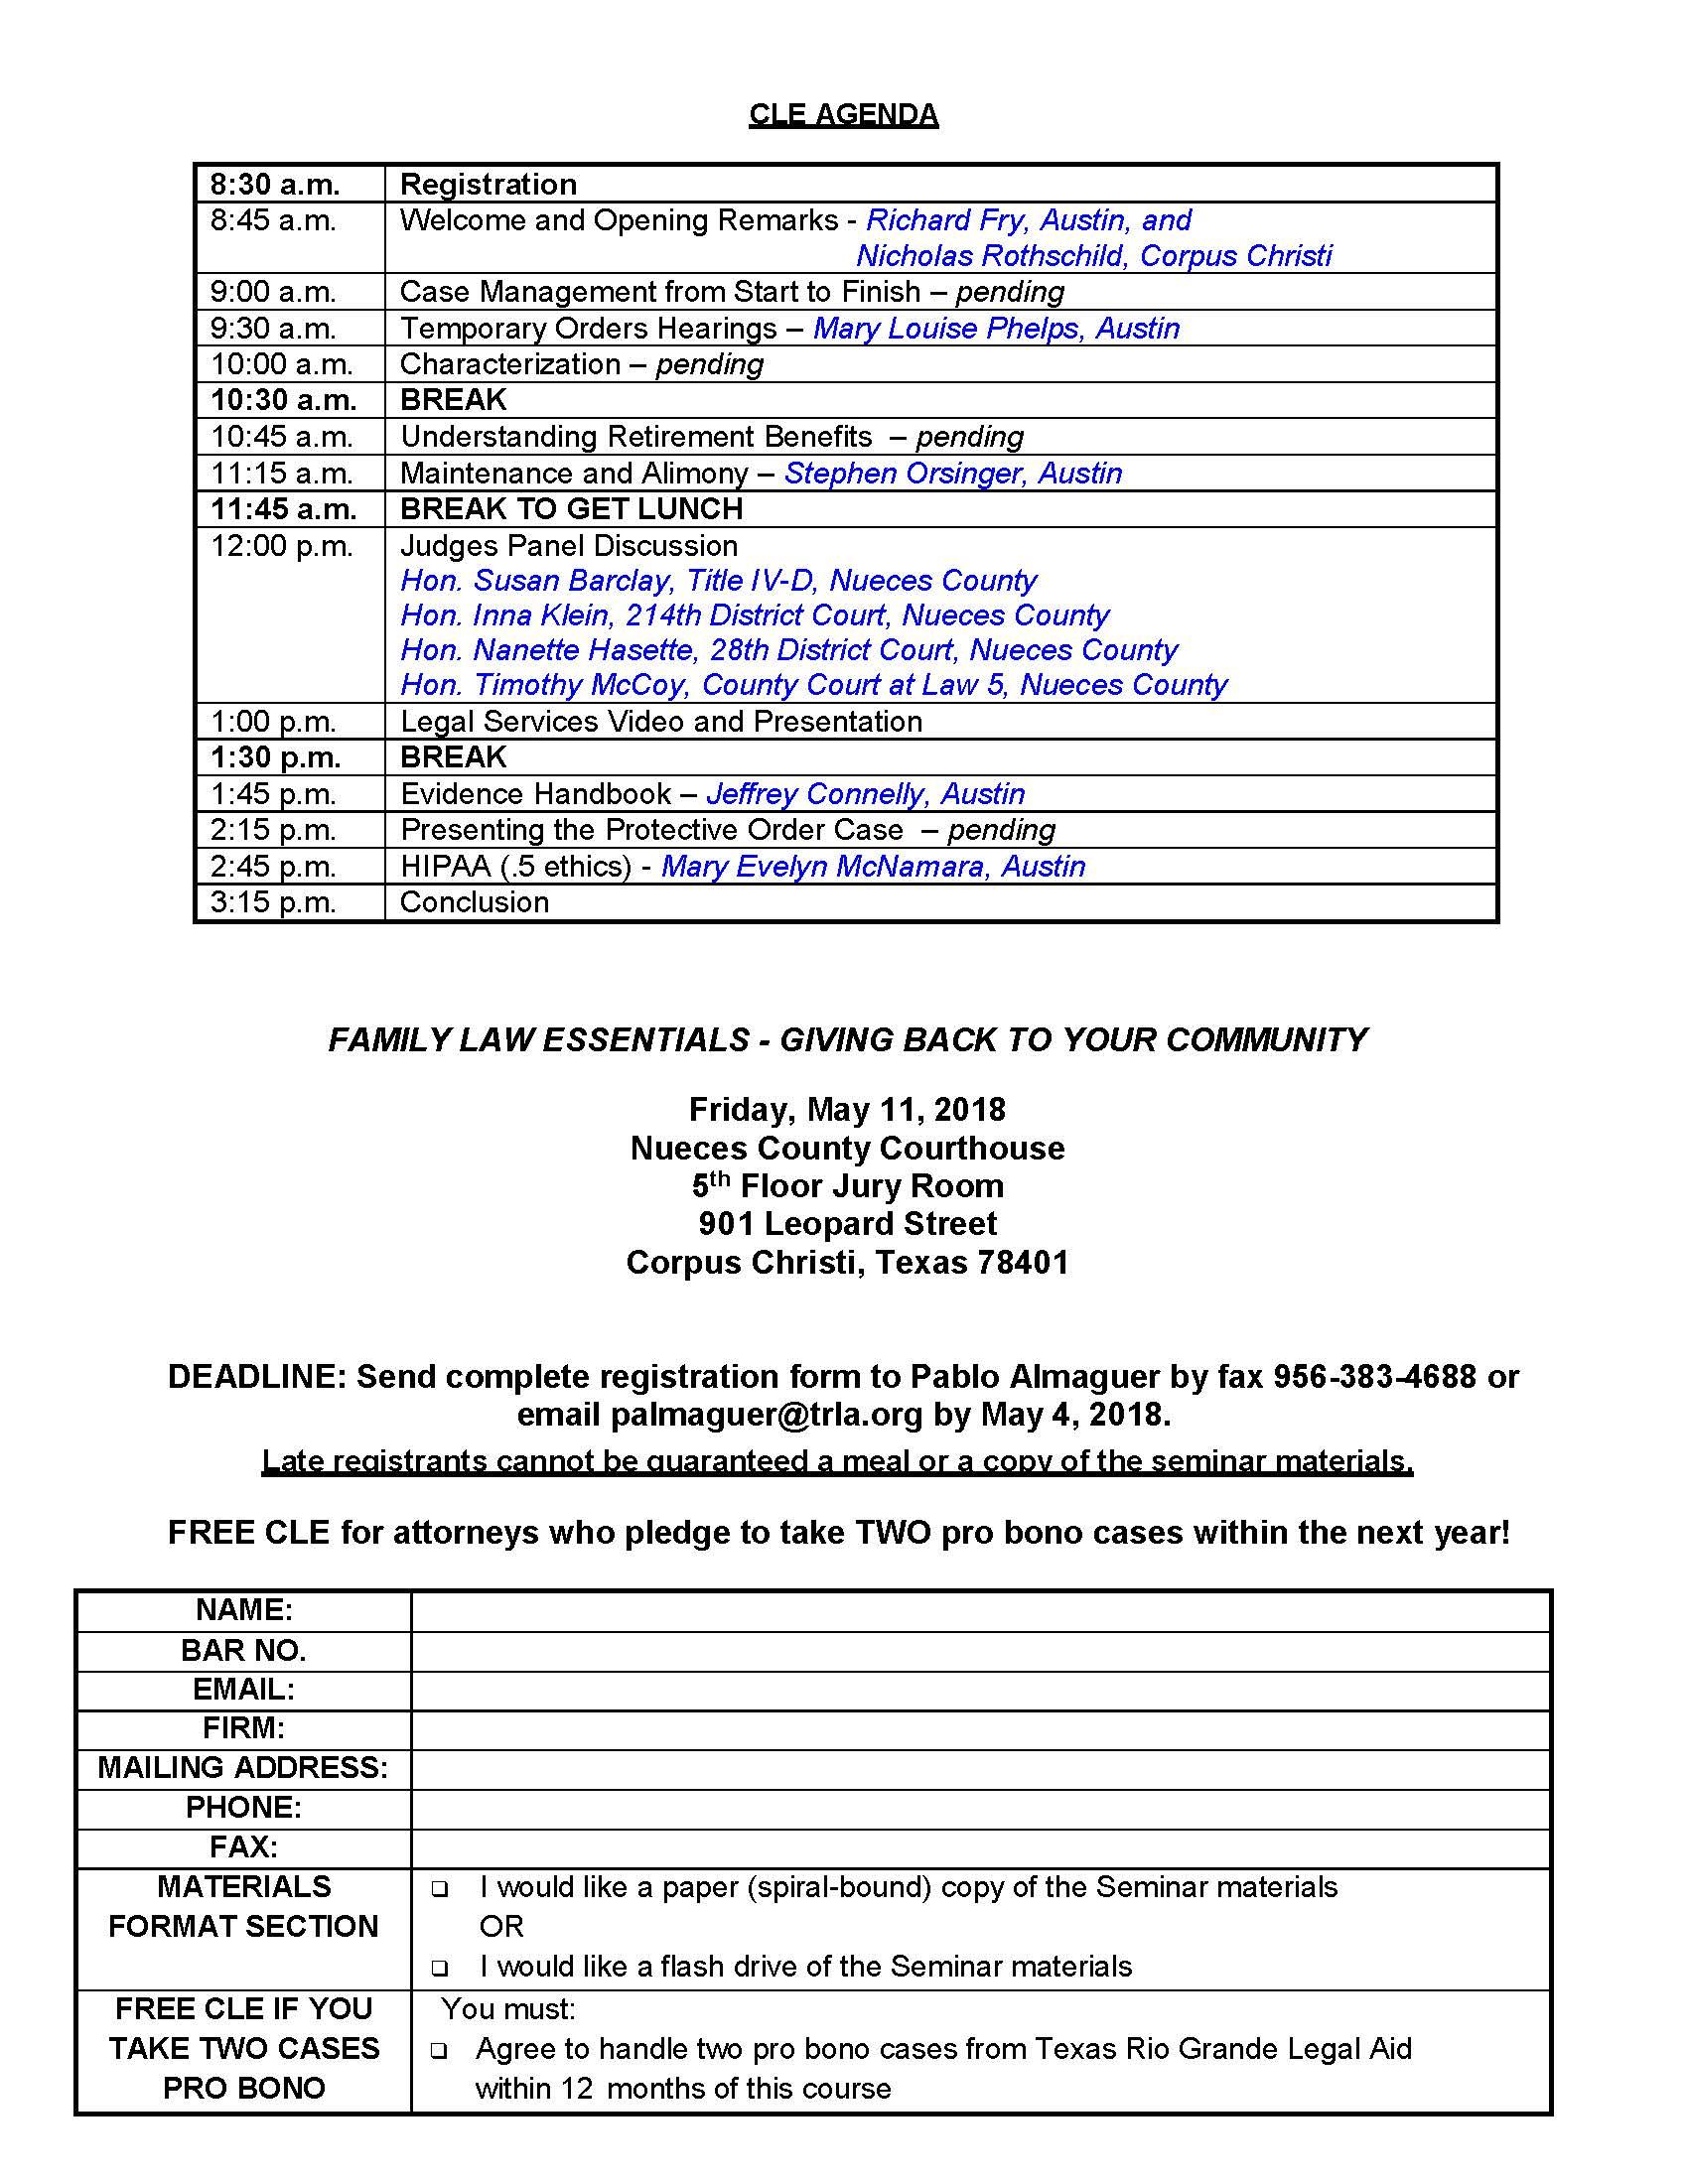 Family Law Essentials Seminar – Corpus Christi Bar Association intended for Wake Family Law Calendar